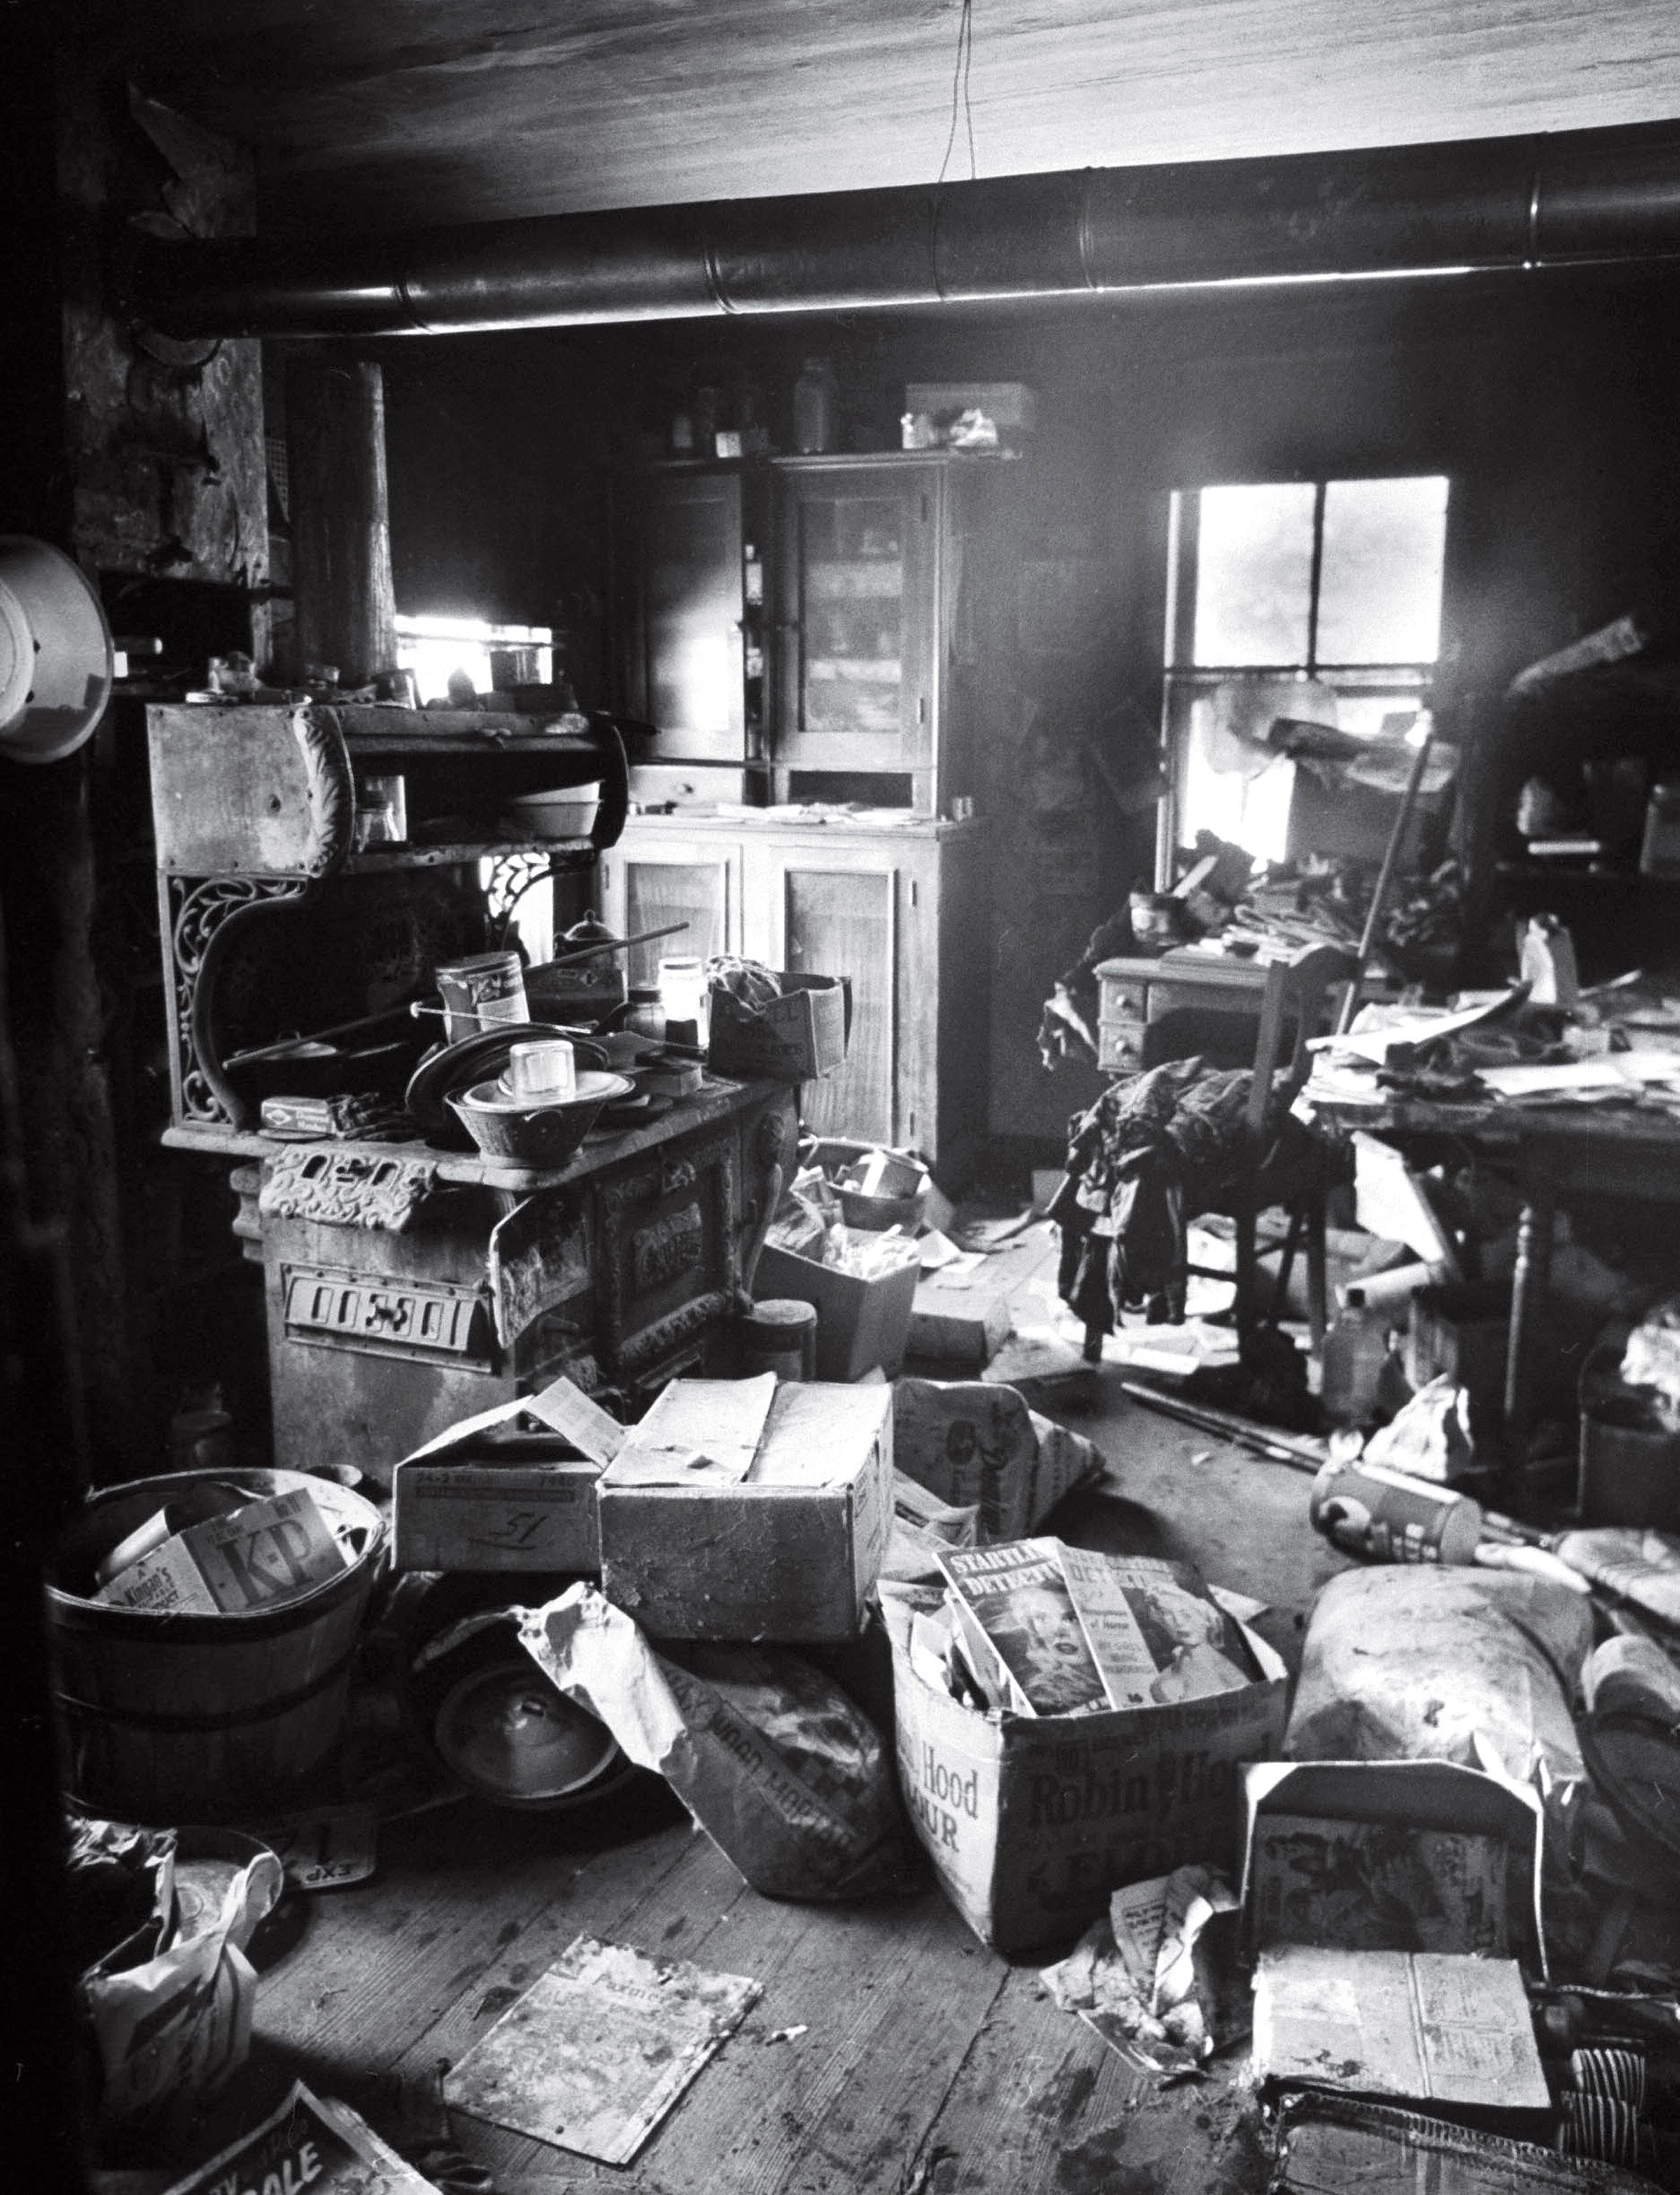 Filthy, cluttered kitchen of alleged mass murderer Ed Gein, where parts of his victim's bodies were found.